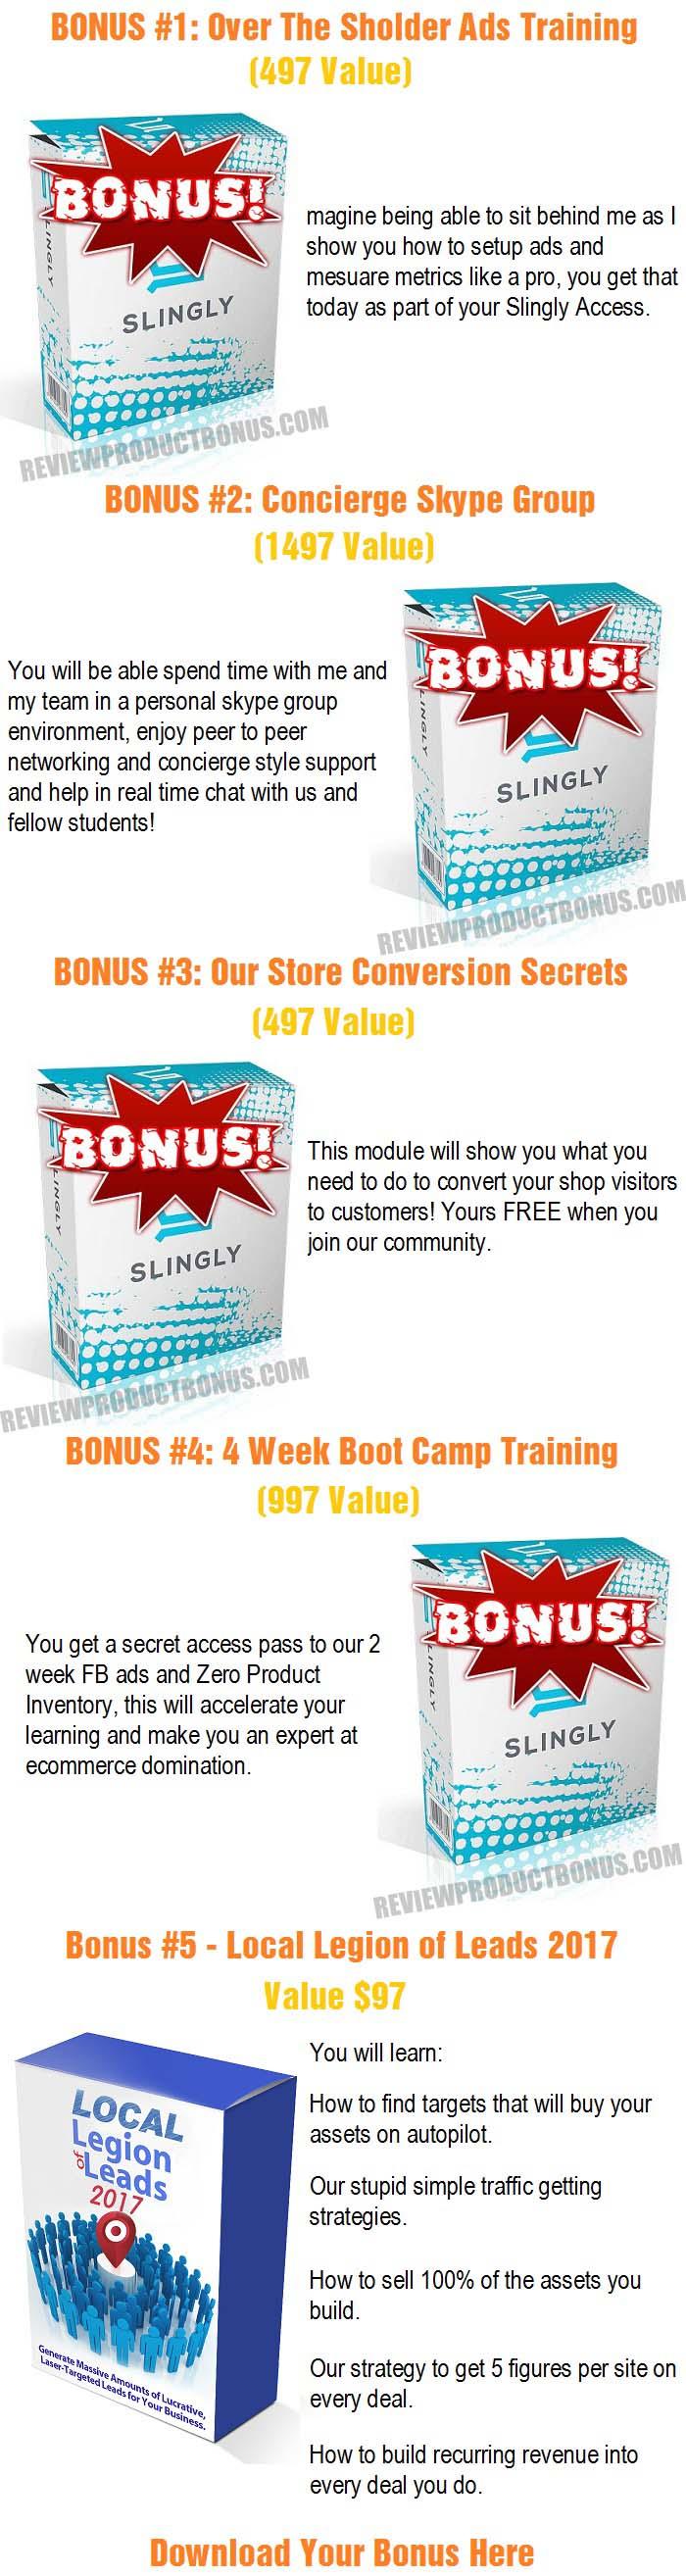 Slingly-Bonus